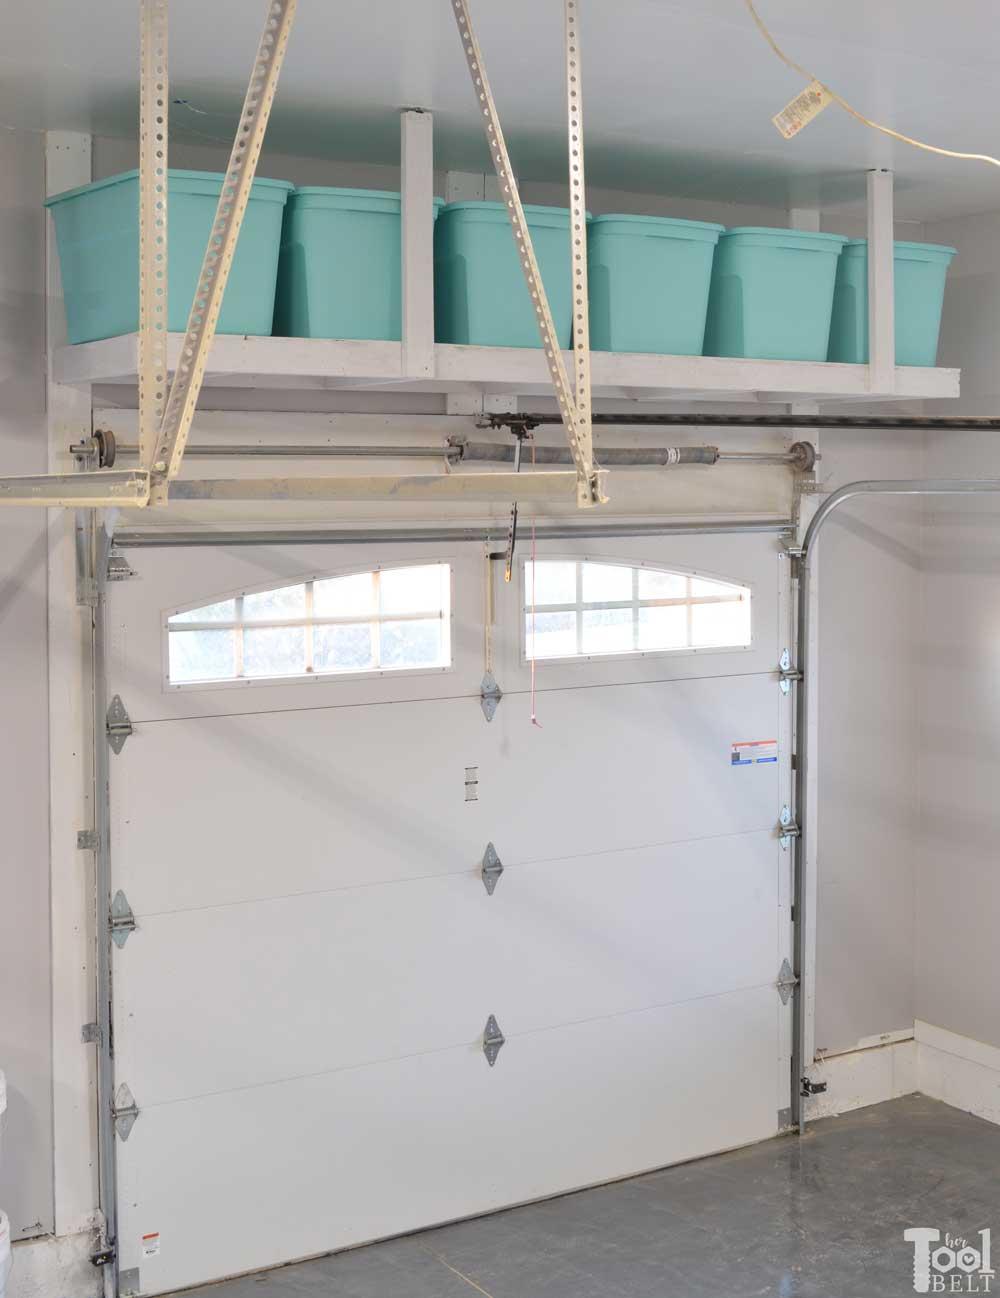 Overhead garage storage shelf her tool belt for Garage and storage building plans